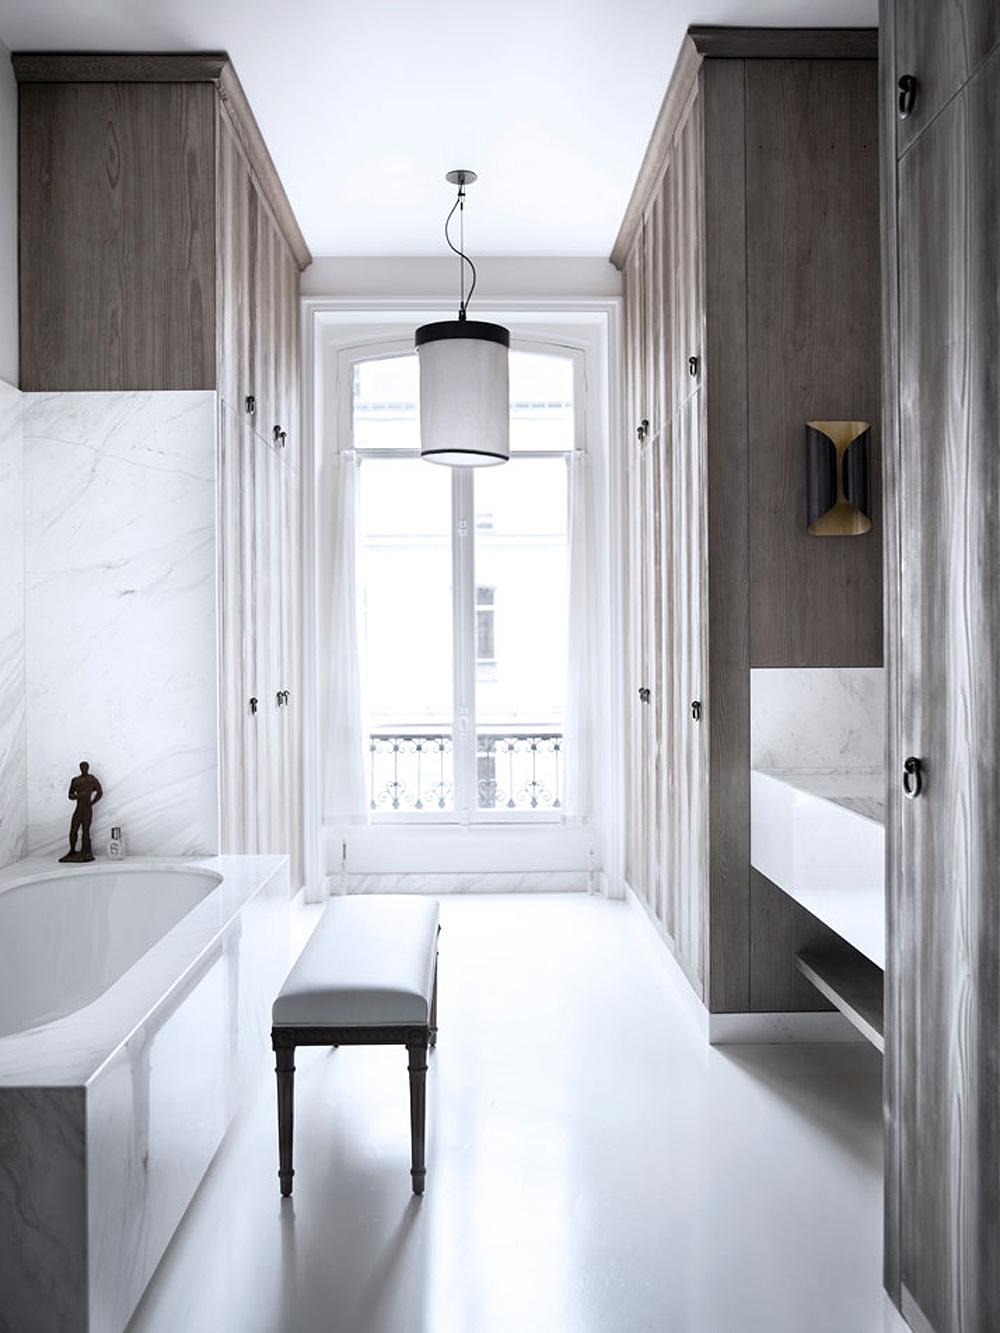 Paris-Apartment-Tour-Art-7.jpg